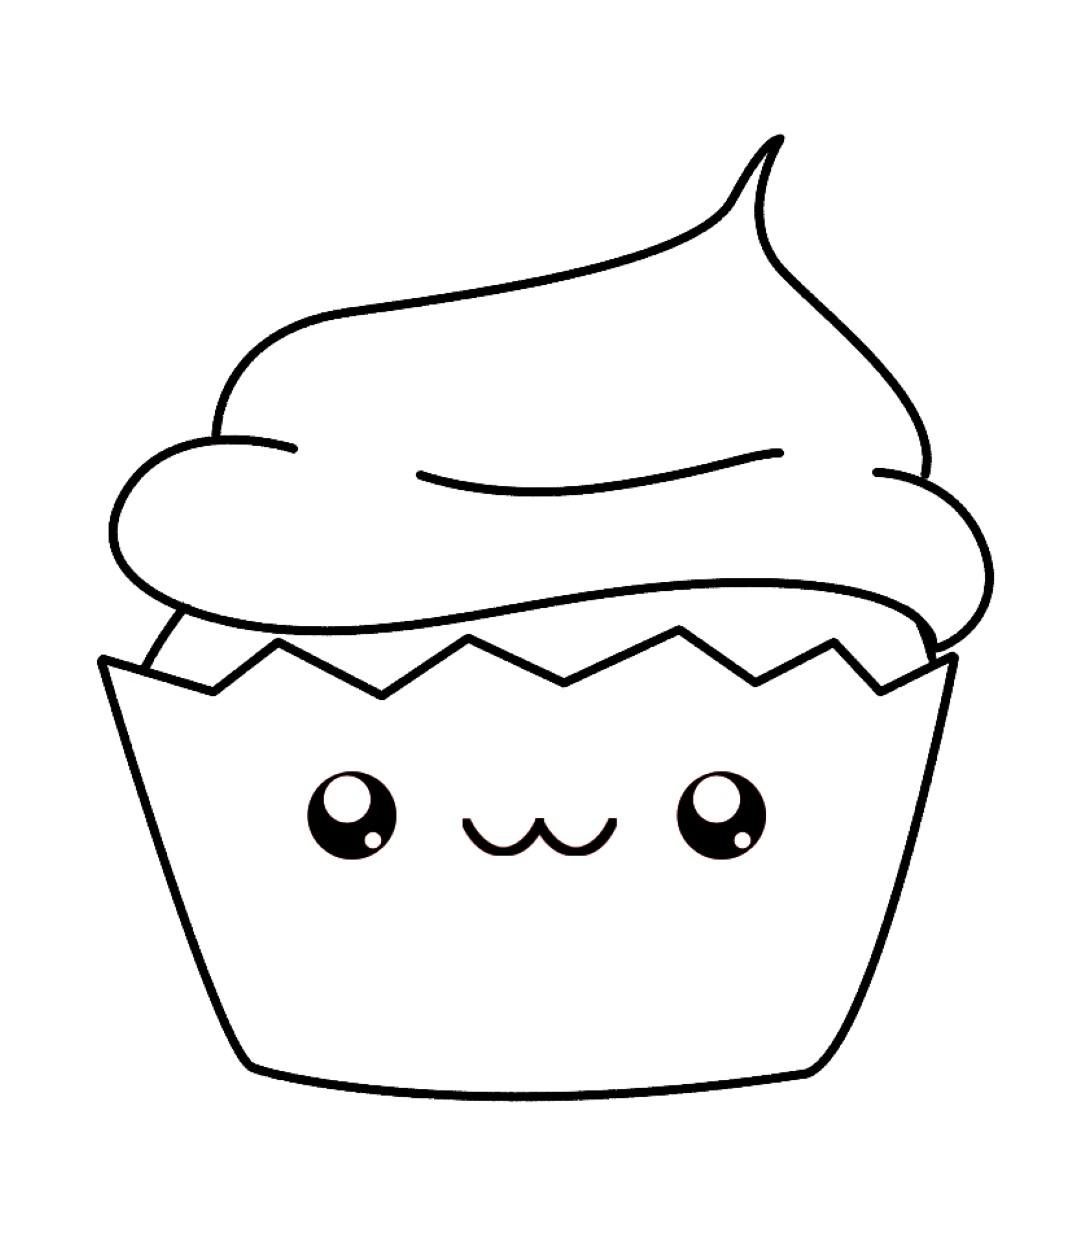 1080x1258 Kawaii Coloring Pages Cupcake